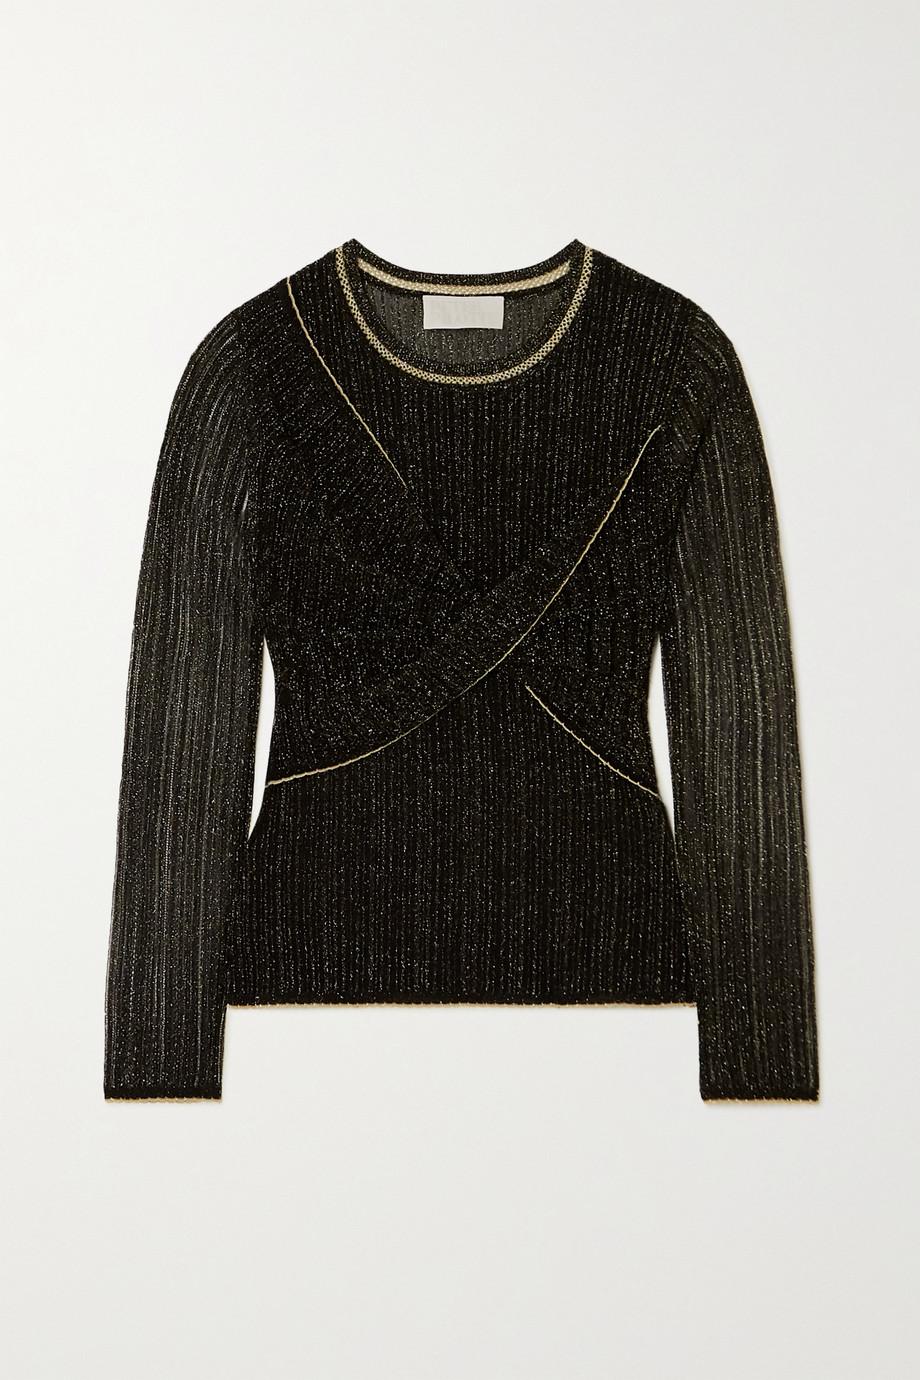 Peter Pilotto Metallic twist-front knit top